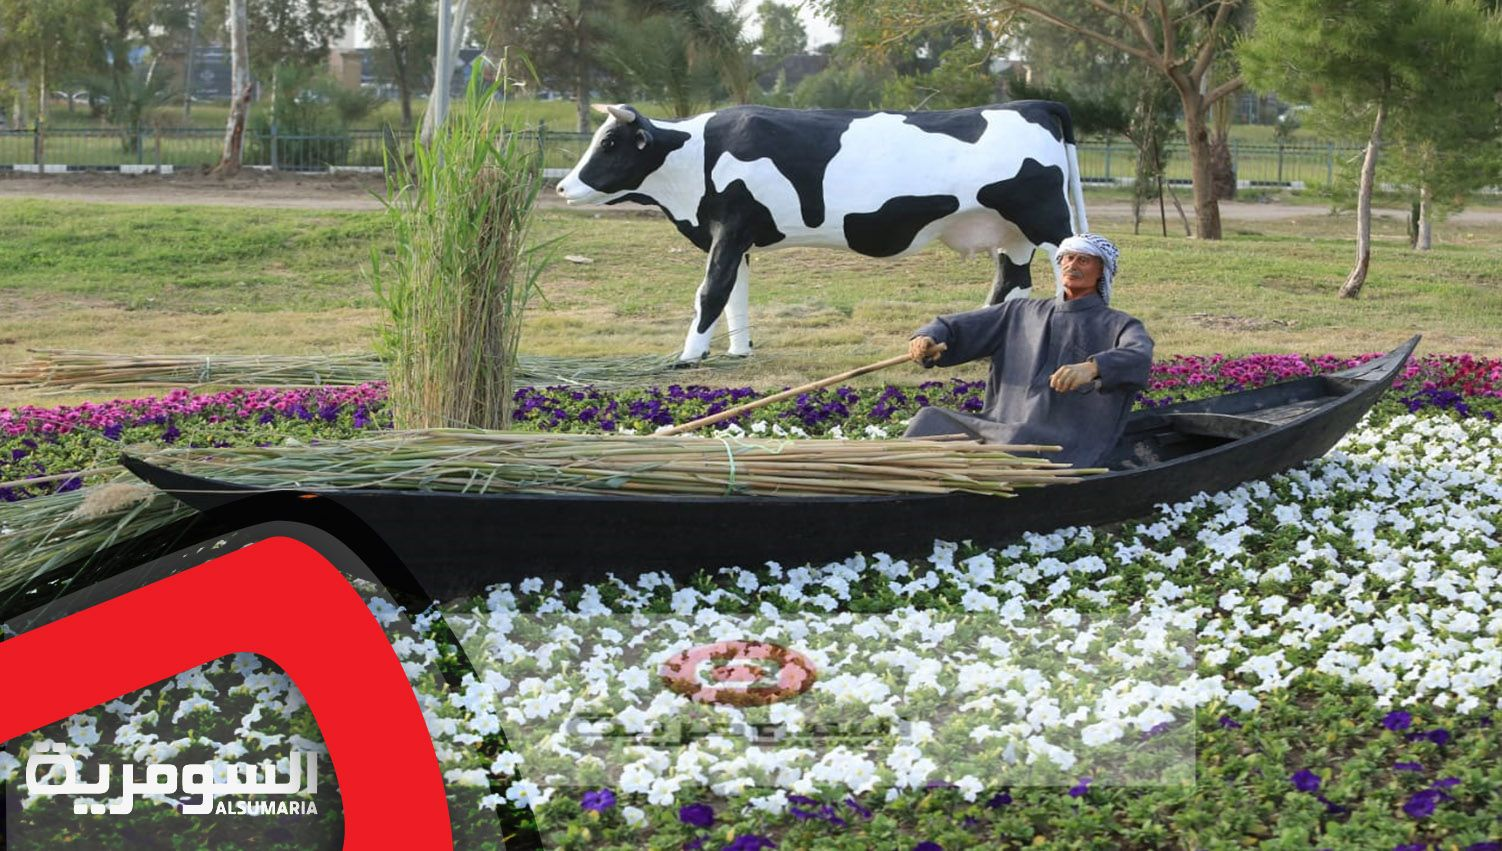 Pin By قناة السومرية Alsumaria Tv On بالصور الزهور تبتسم في أحضان بغداد Animals Cow